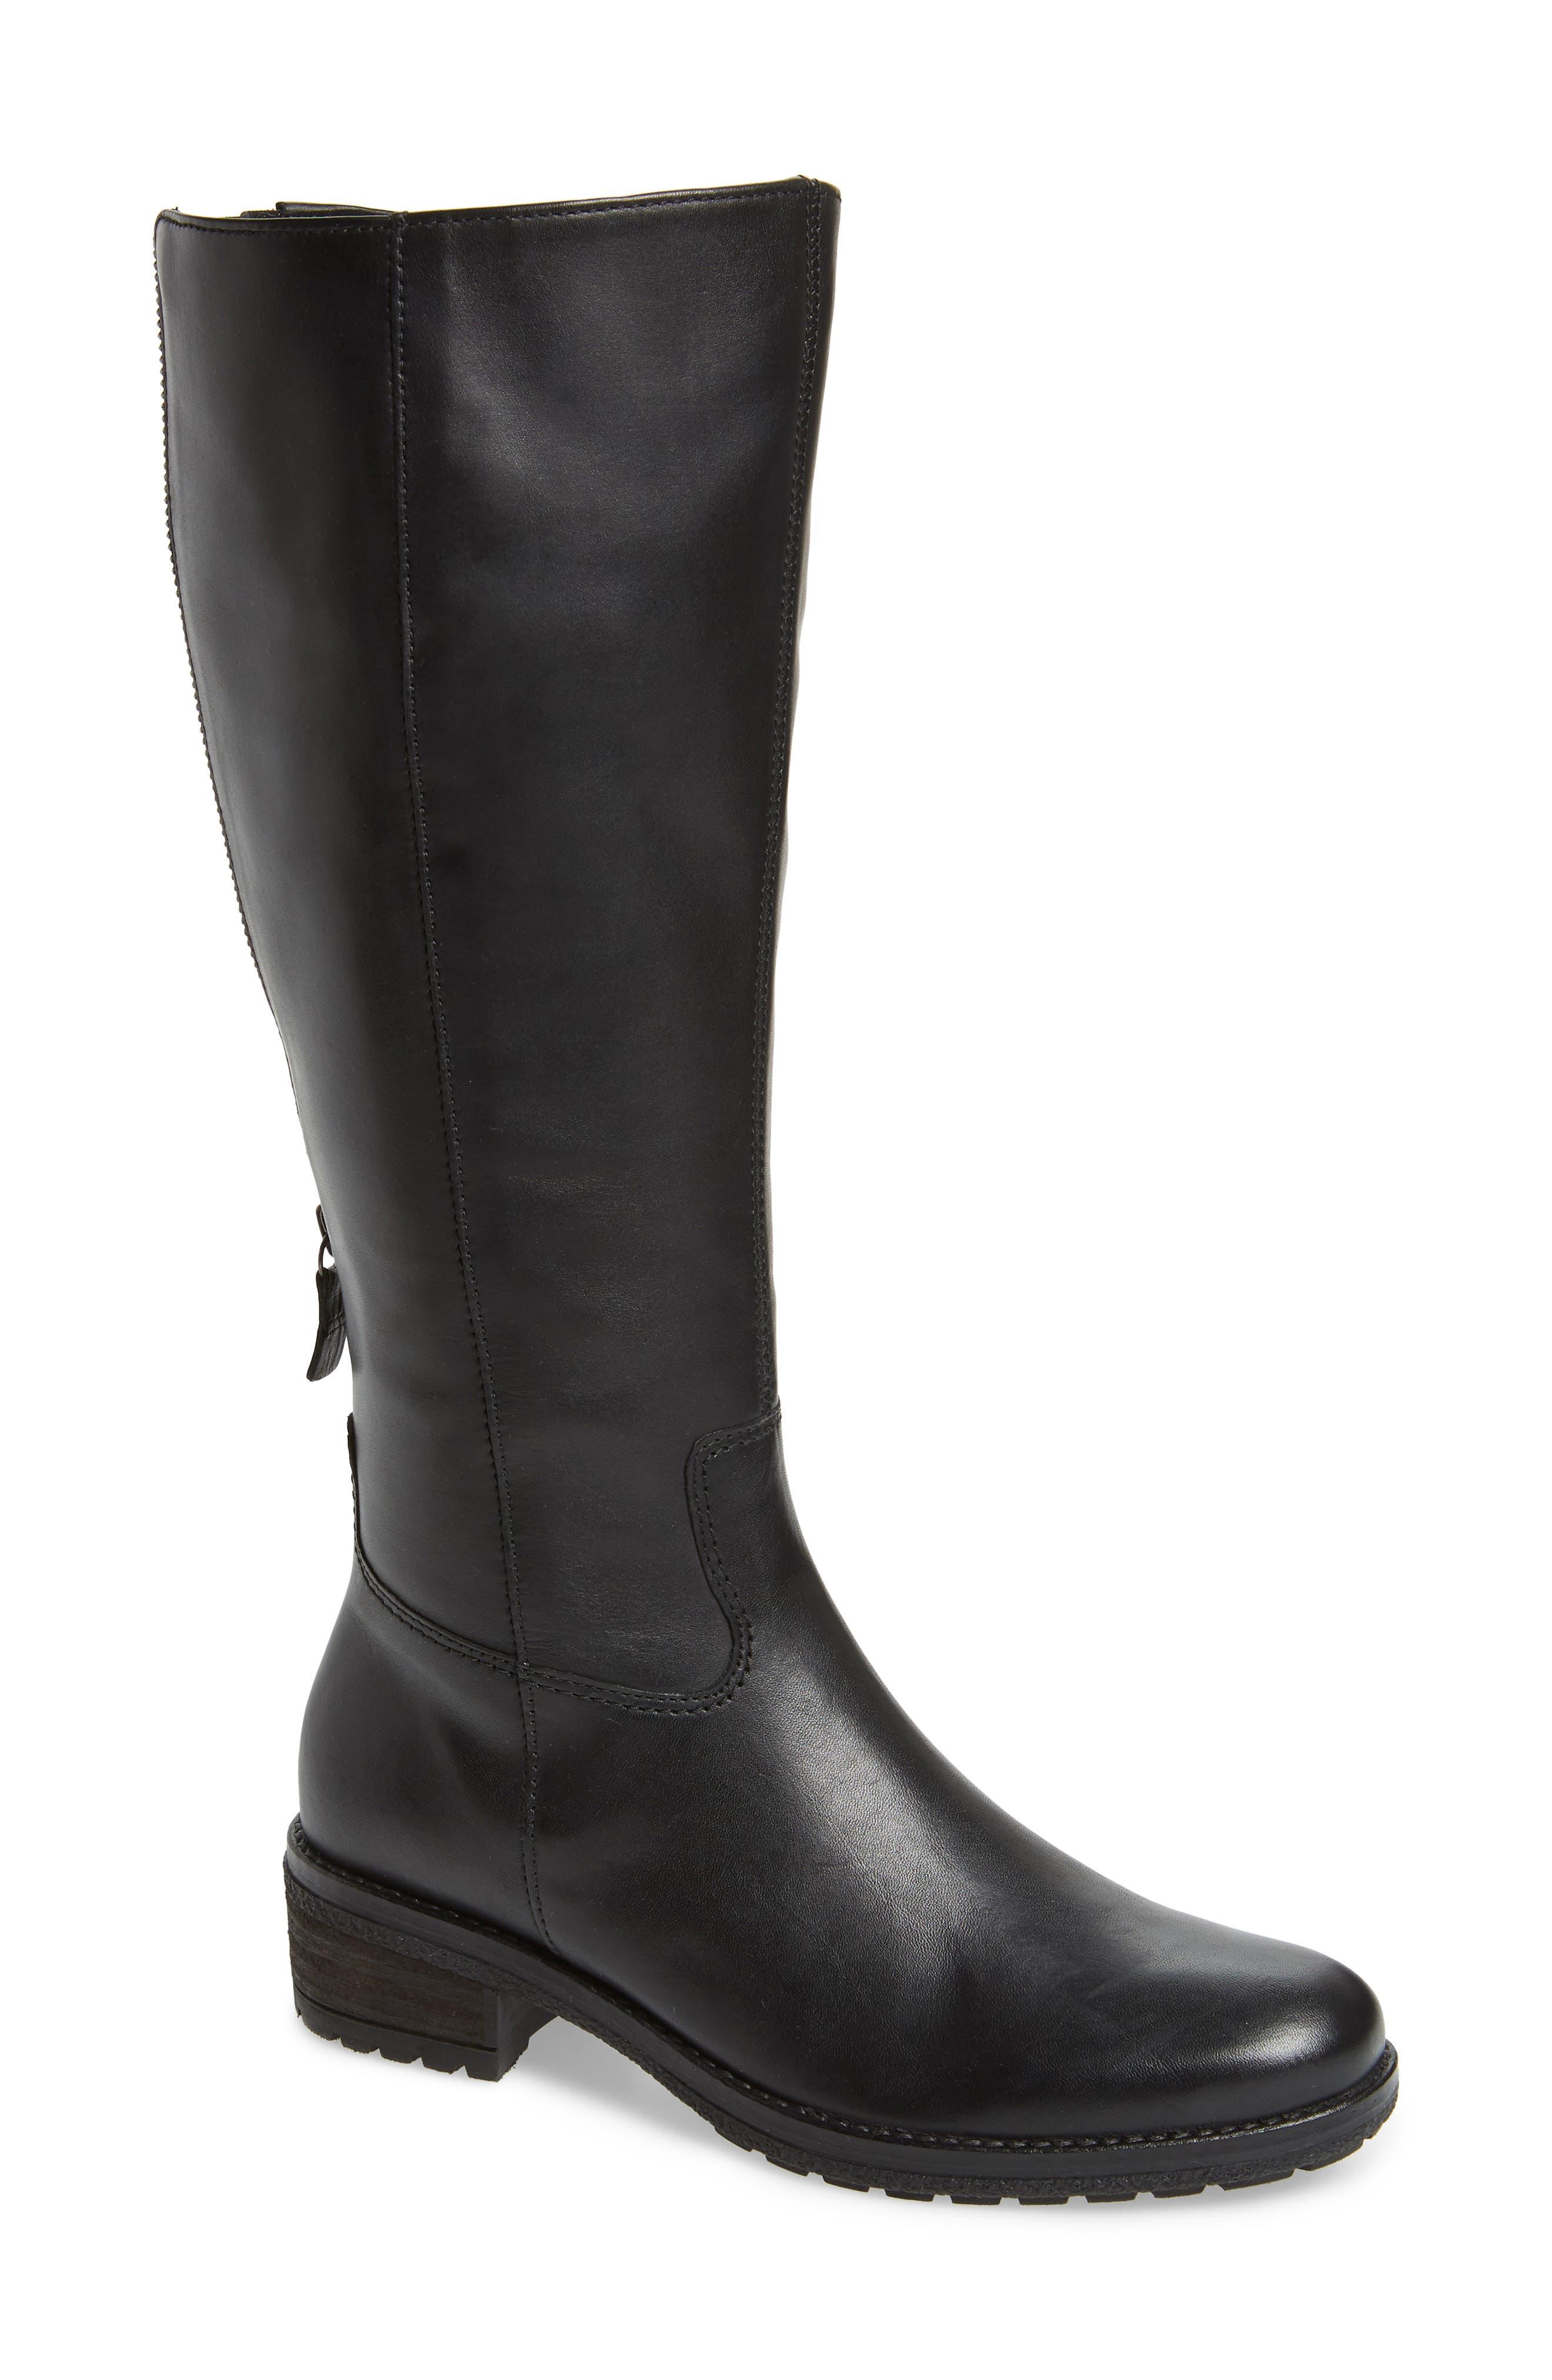 Gabor Classic Comfort Knee High Riding Boot, Black